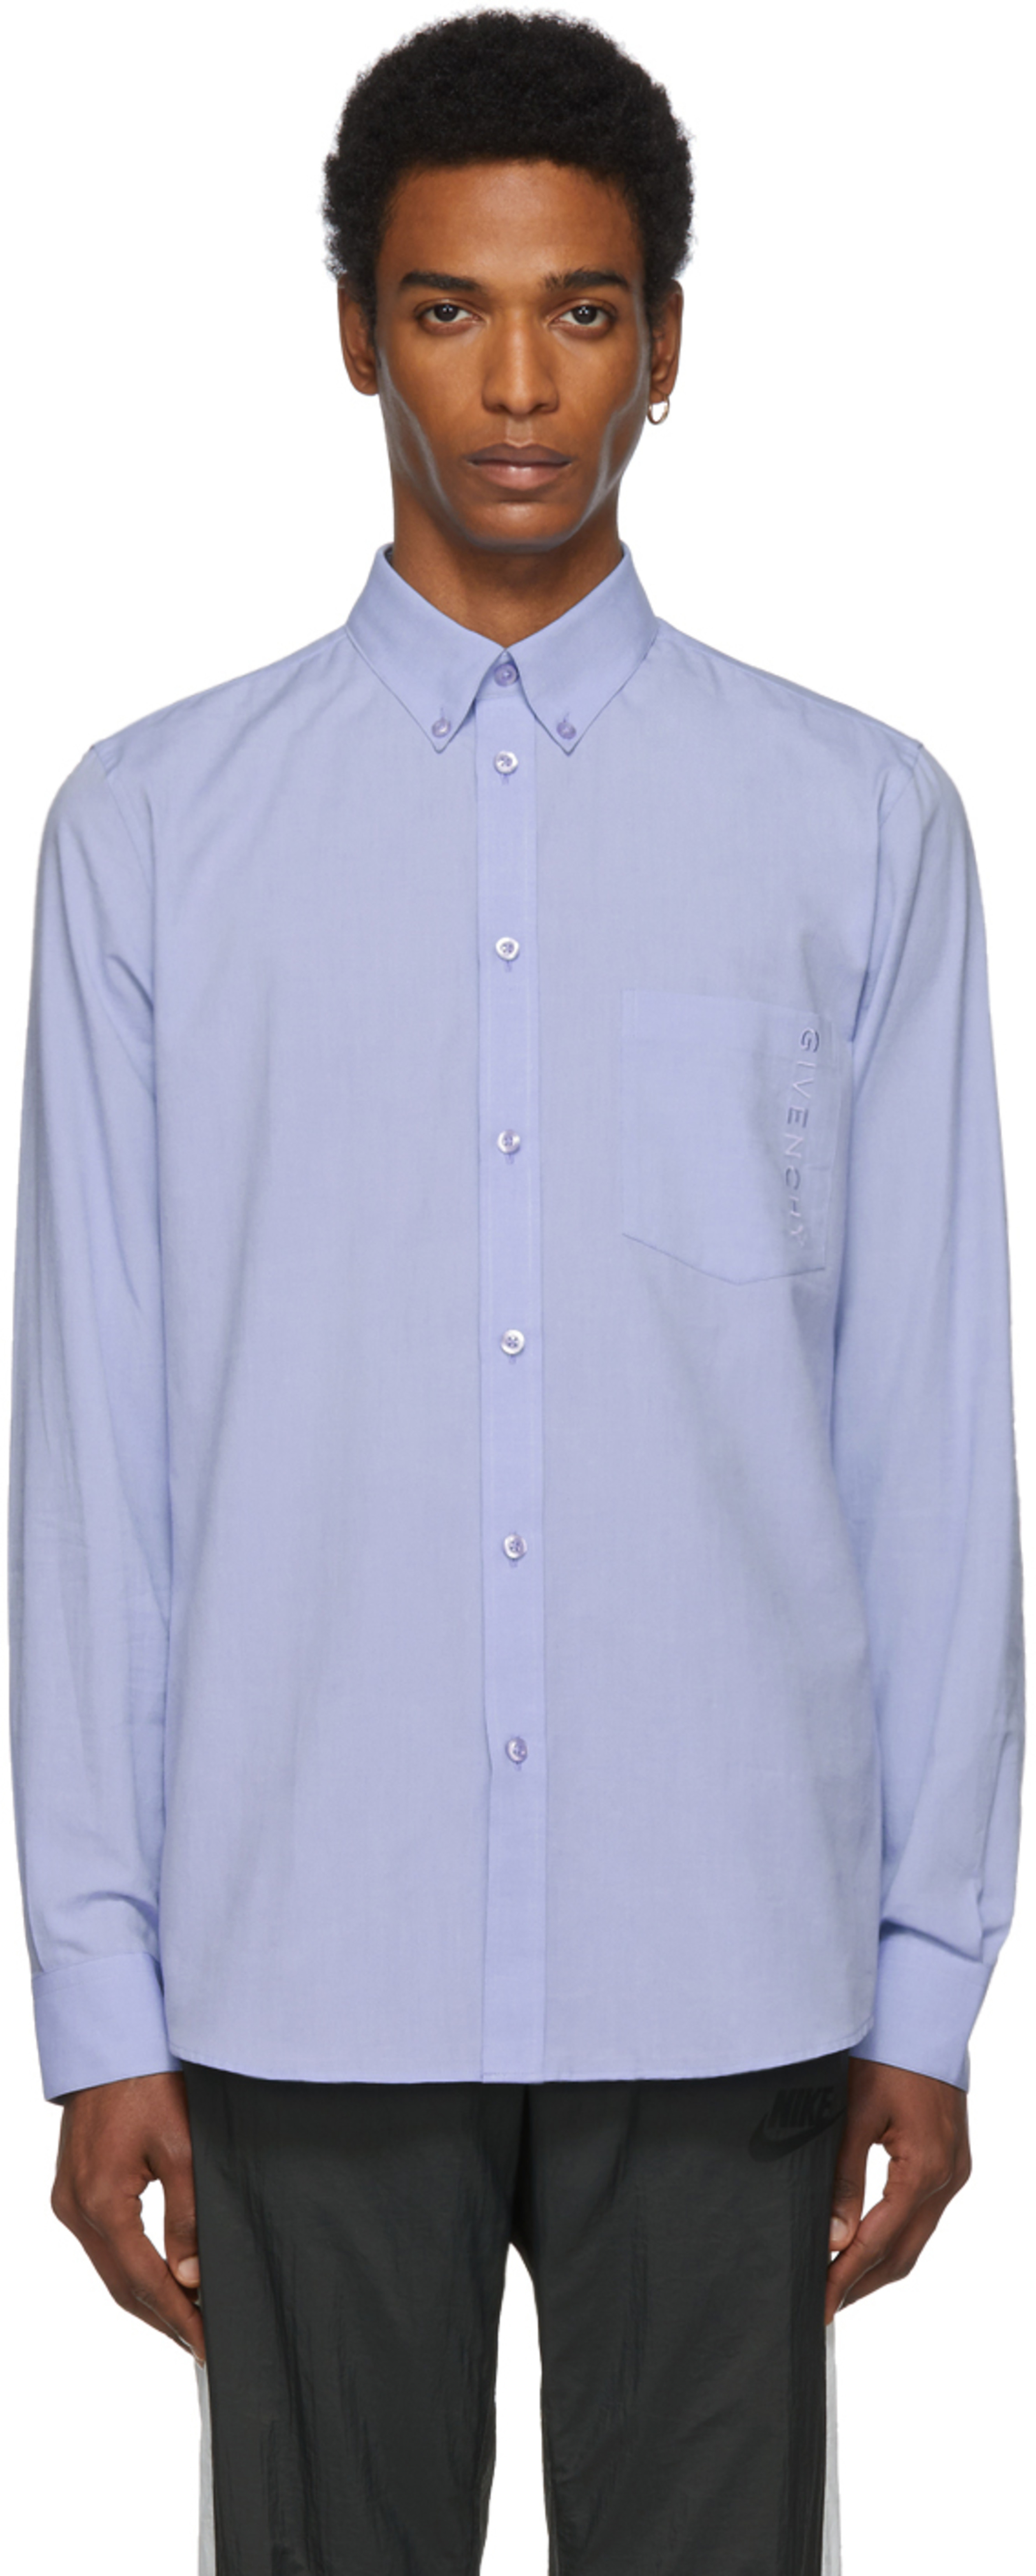 05cf60edccbf Gucci Floral Print Short Sleeve Shirt | Saddha